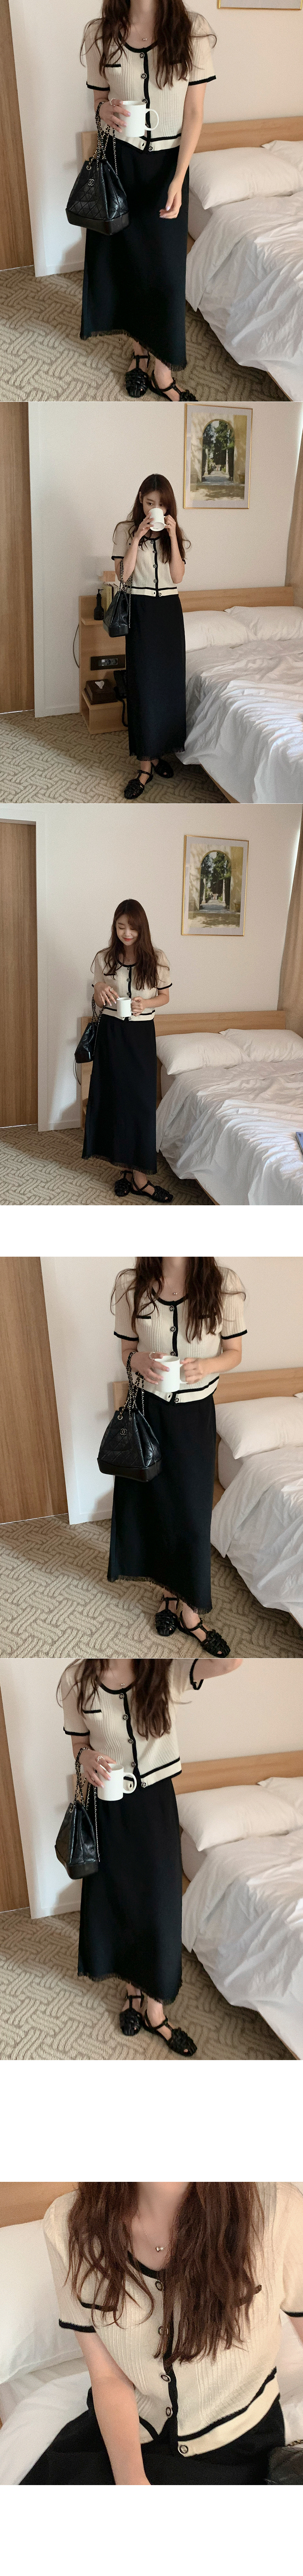 Missing surgery long skirt